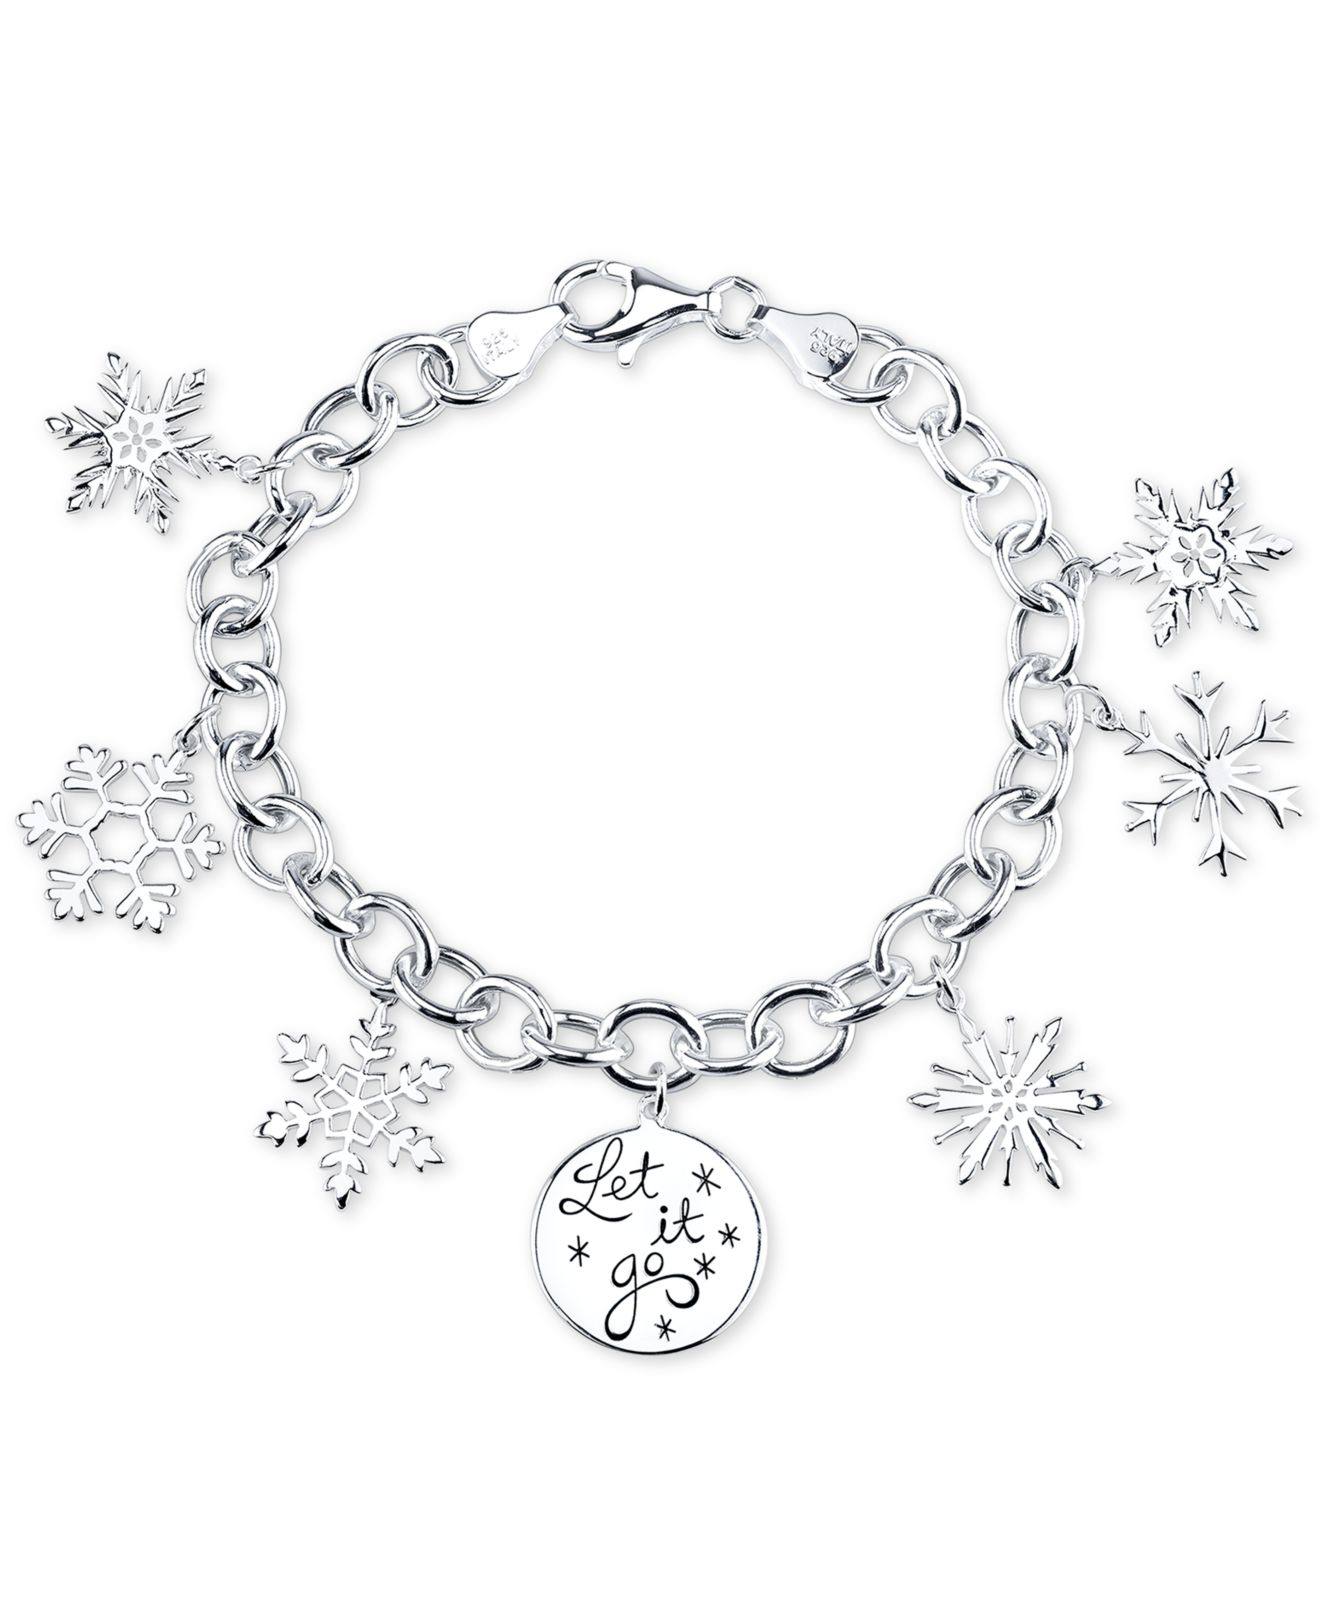 Snowflake Charm Bracelet: Disney Frozen Snowflake Charm Bracelet In Sterling Silver